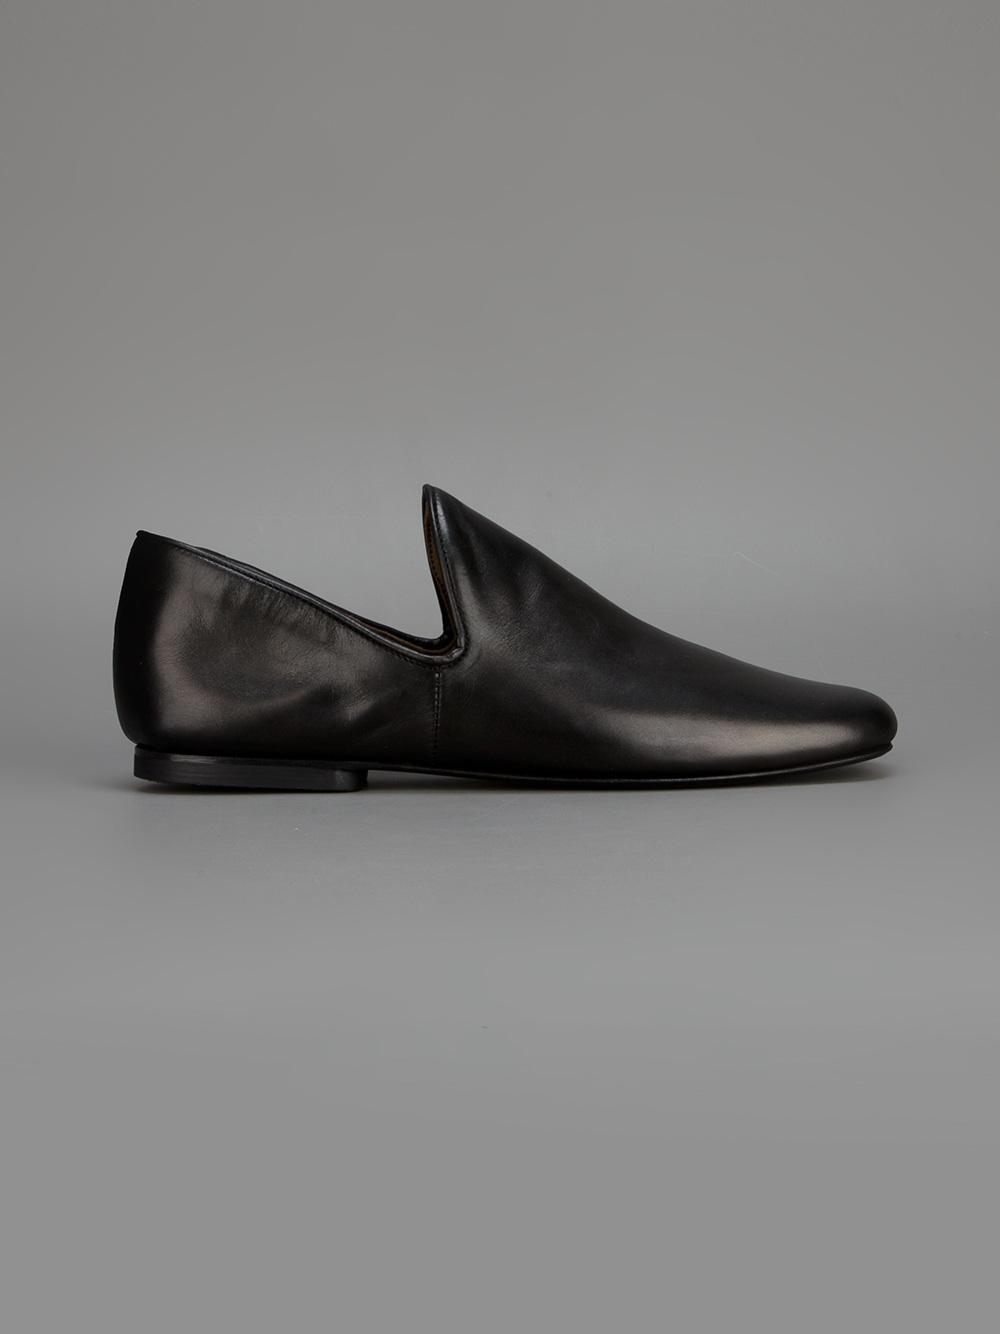 Christophe Lemaire Minimalist Loafer In Black For Men Lyst